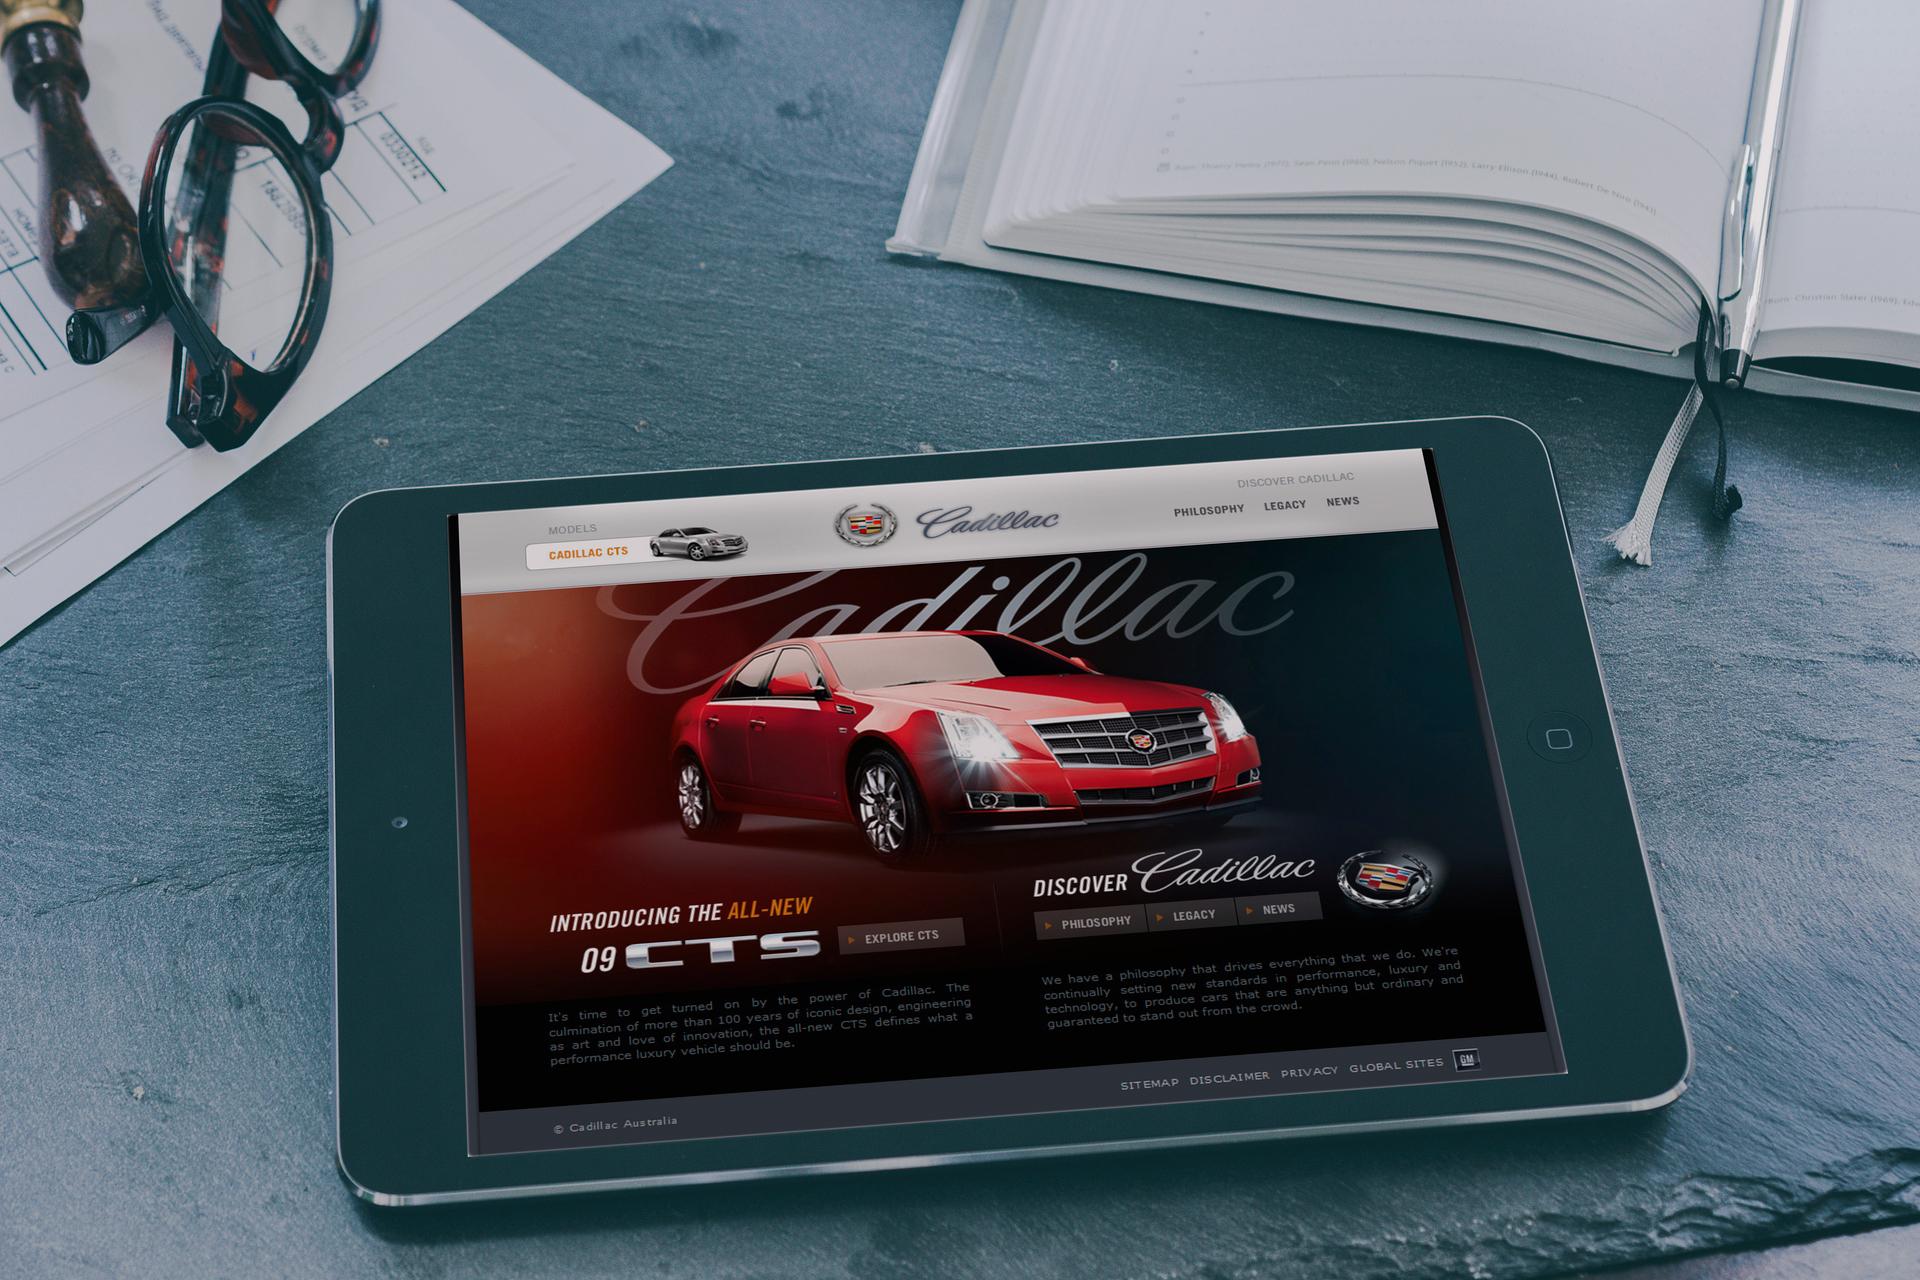 Cadillac Australia